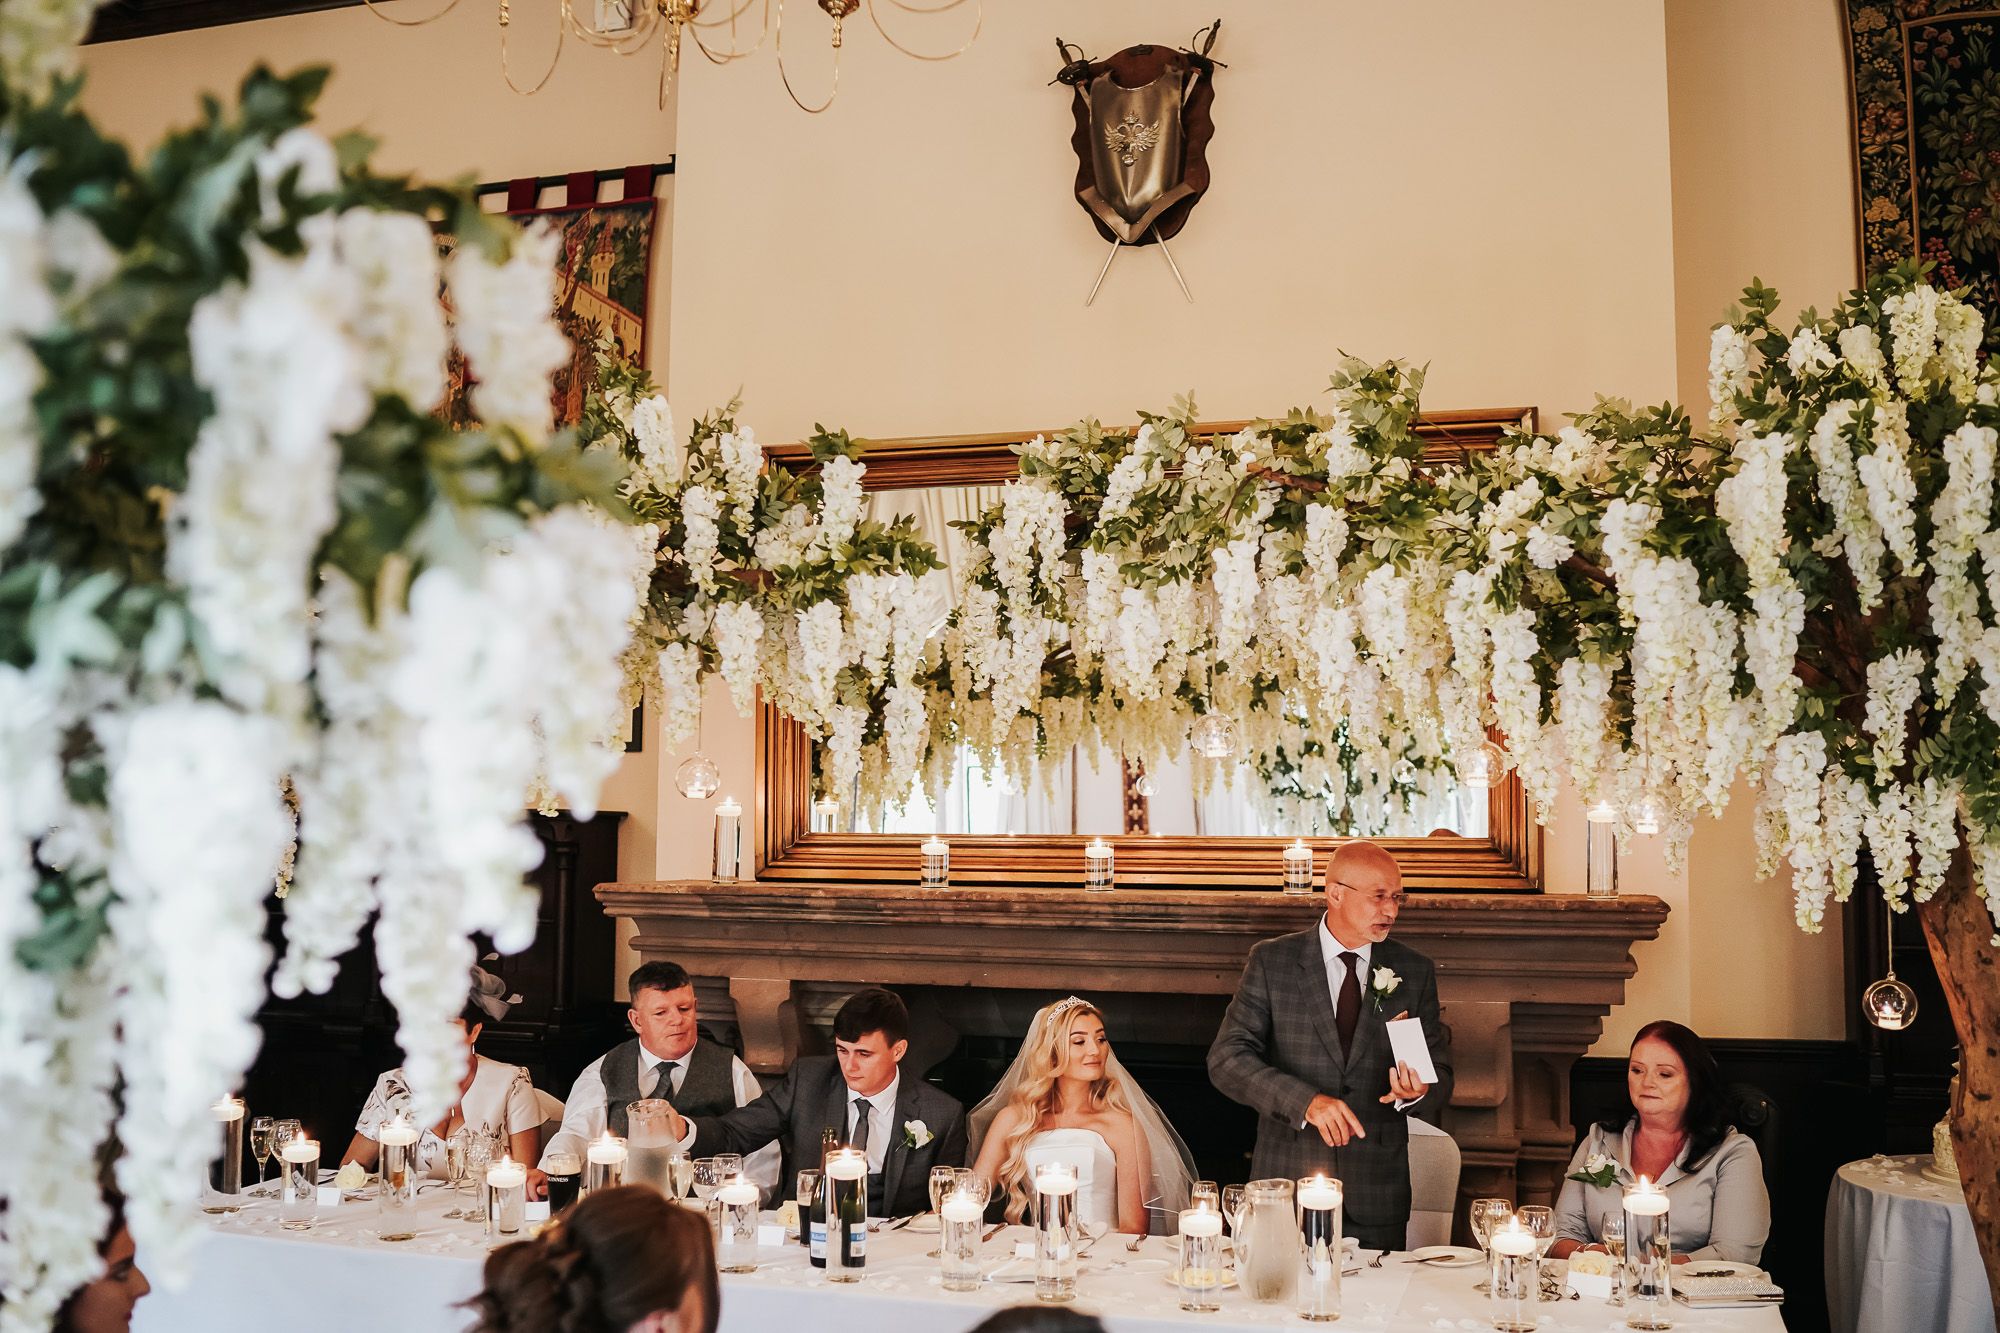 Peckforton Castle wedding photography cheshire wedding photographer (39 of 57).jpg